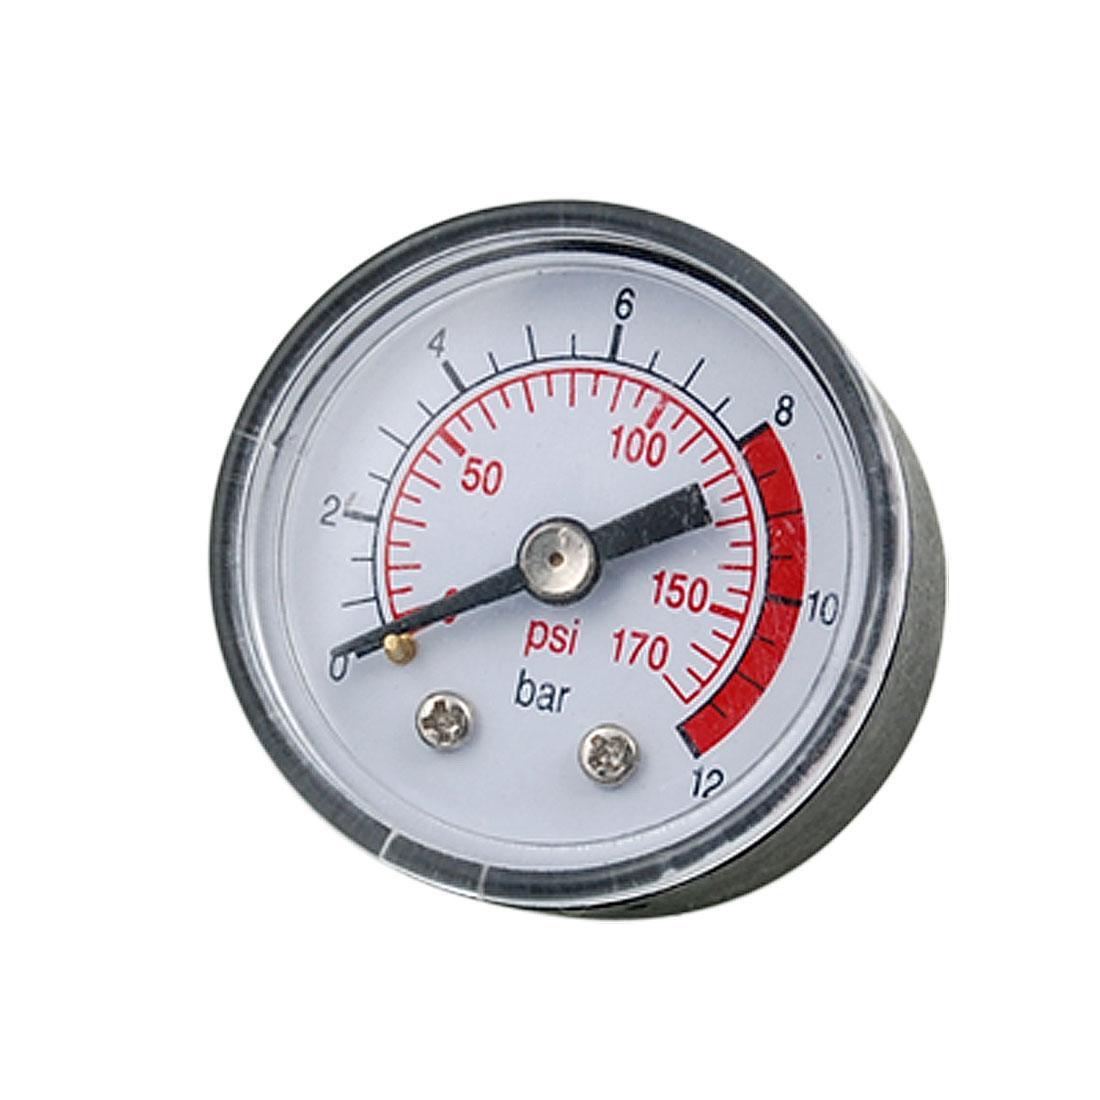 Black Clear 170 Psi Compressor Pressure Gauge Measurement Tool